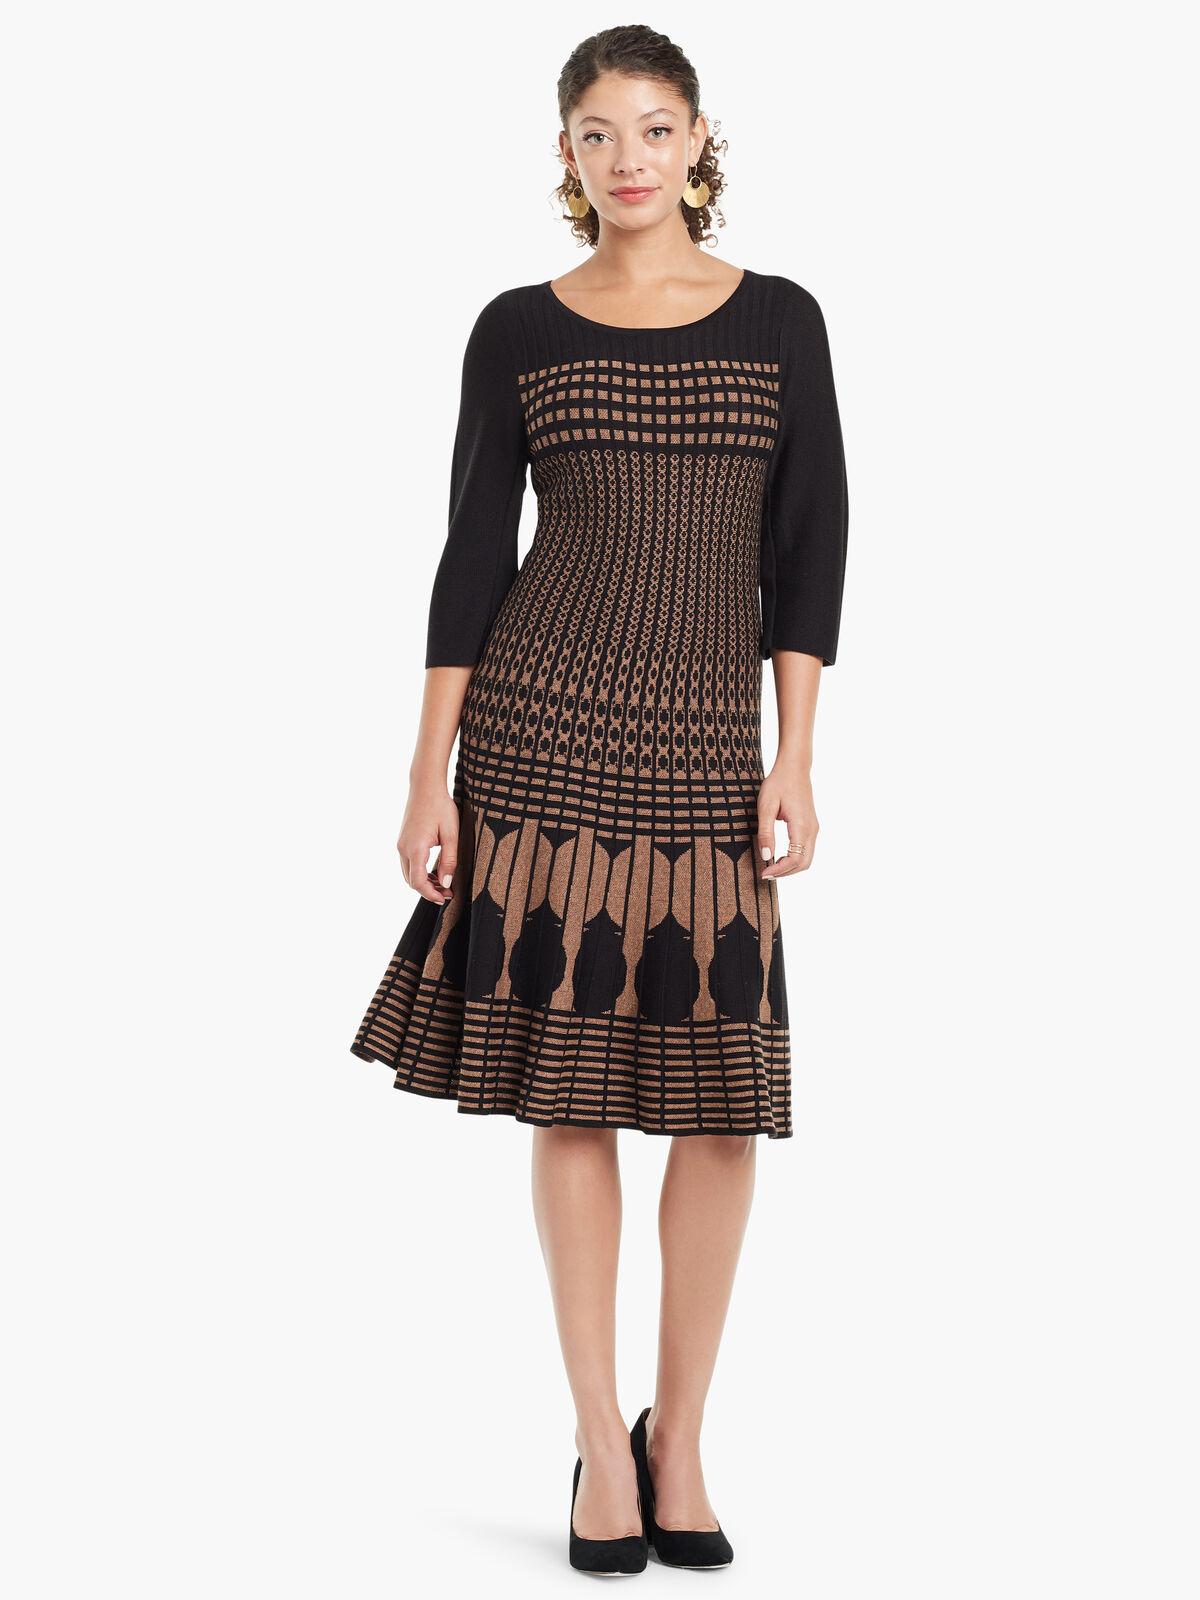 Ellipse Twirl Dress